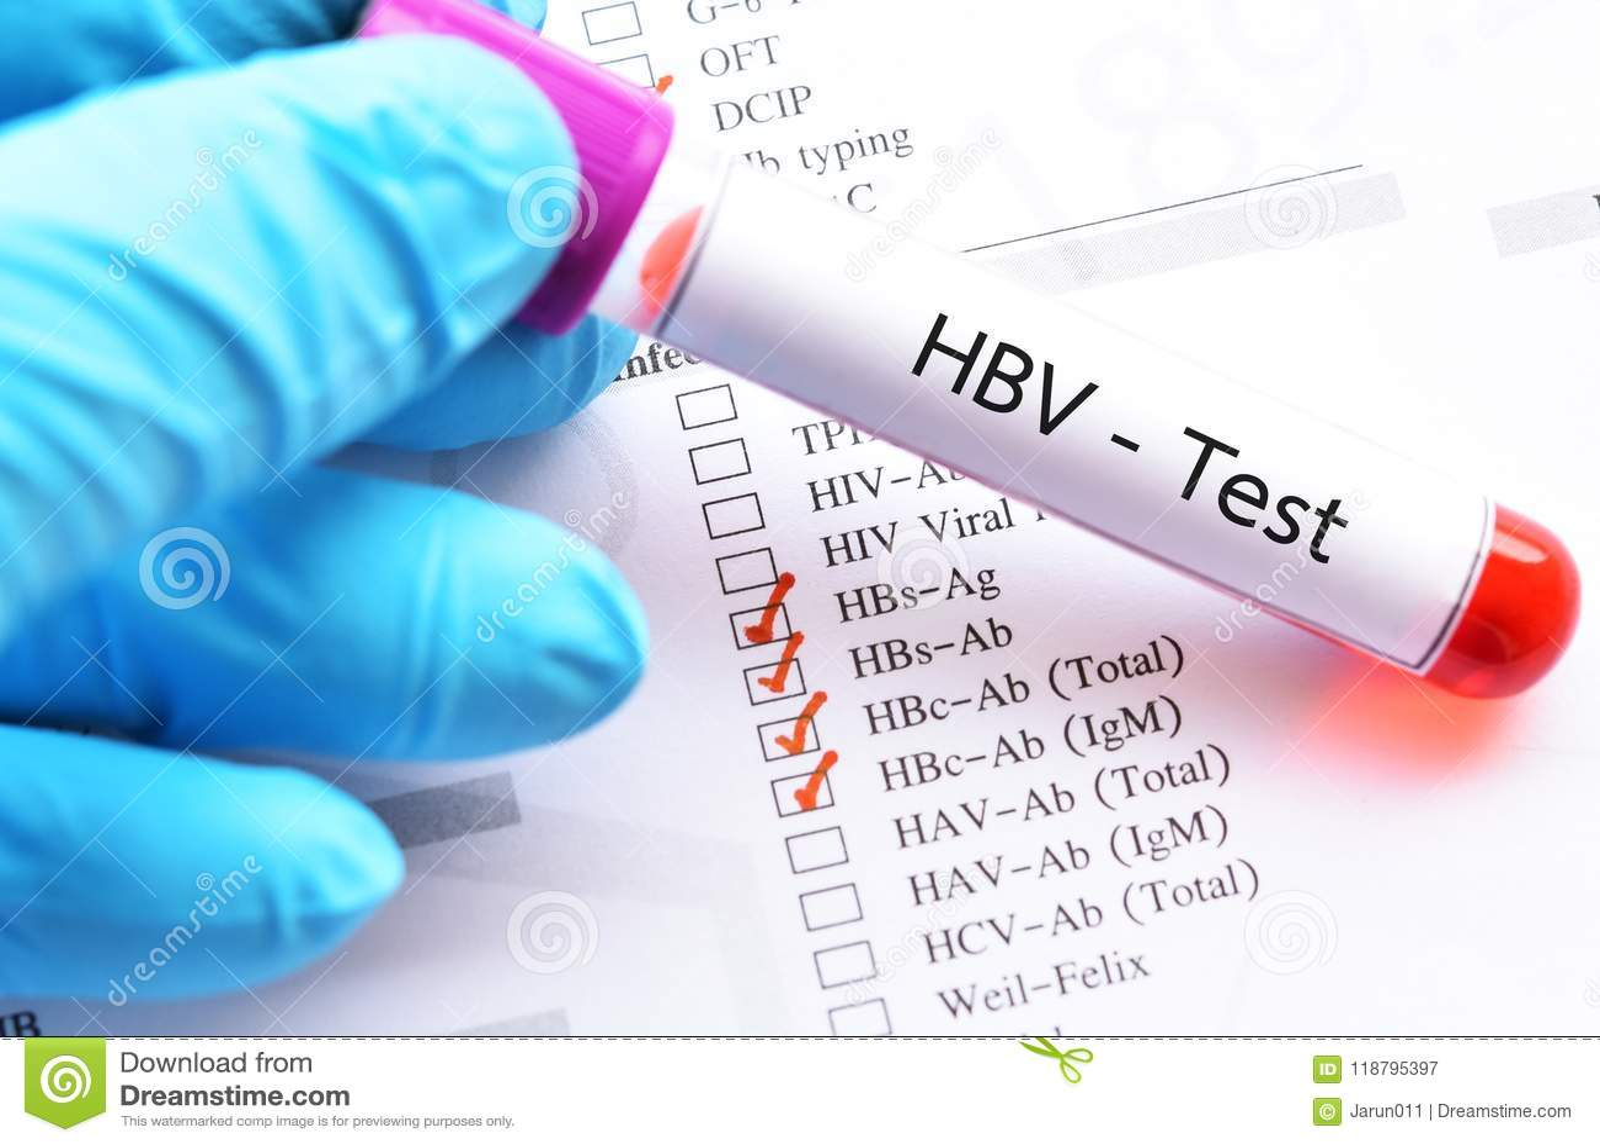 Blood Sample Tube For Hbv Profile Test Stock Image